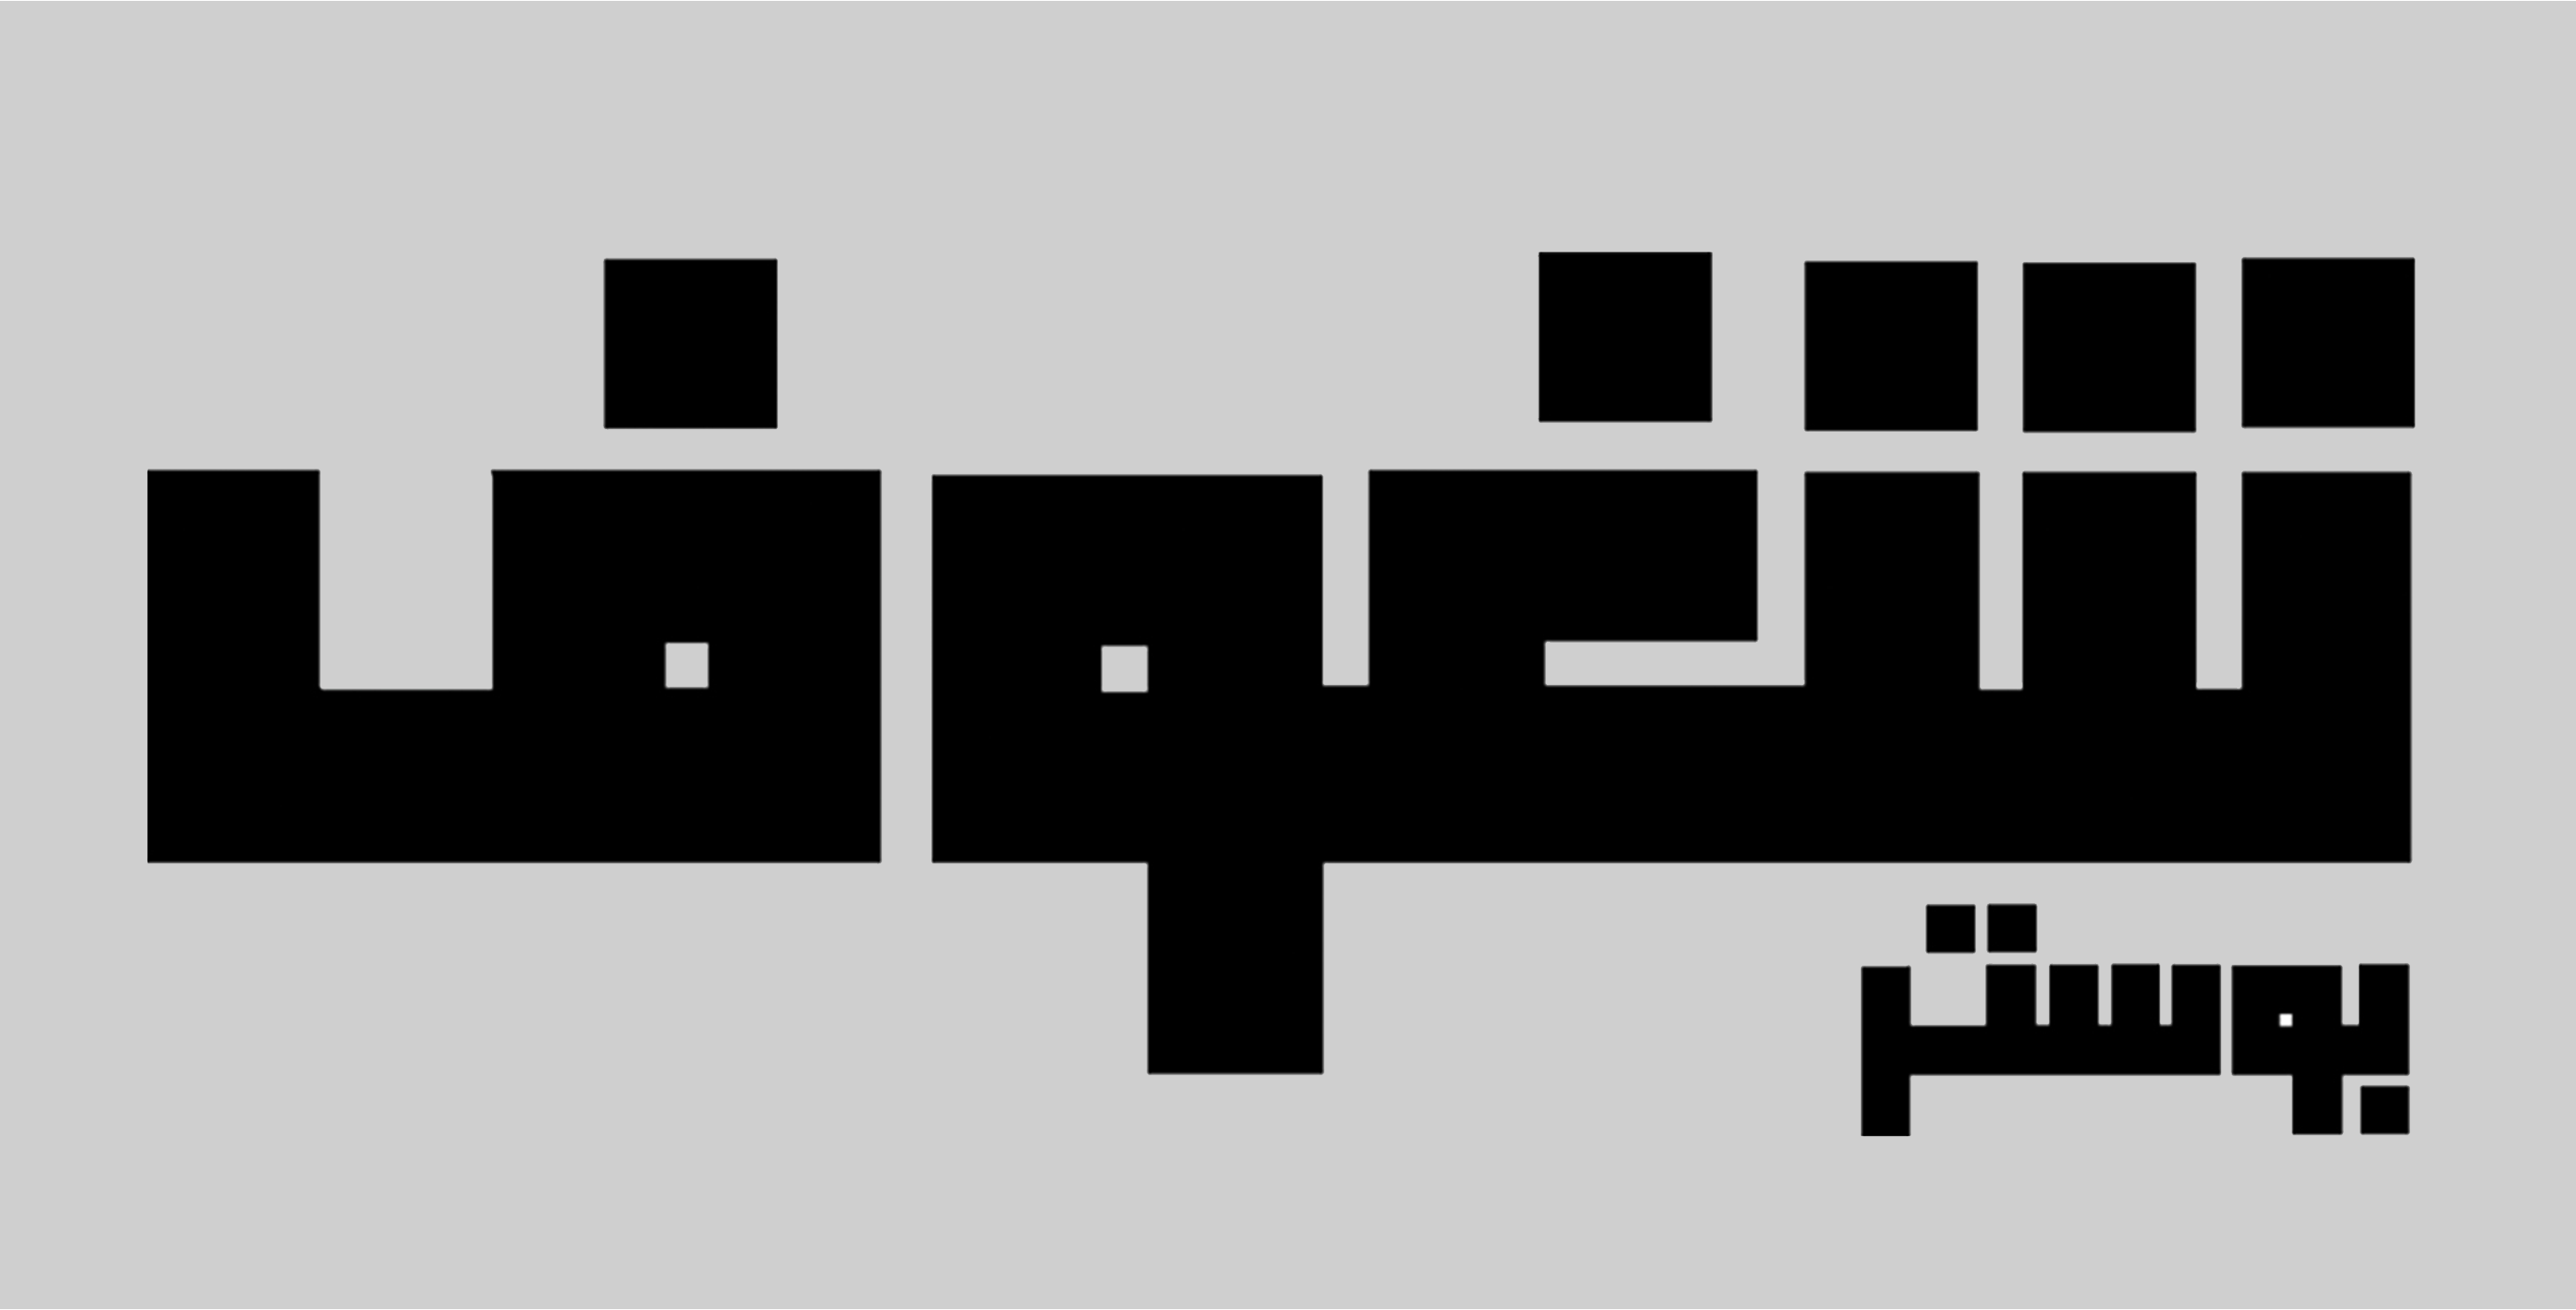 شغوف | Shagof